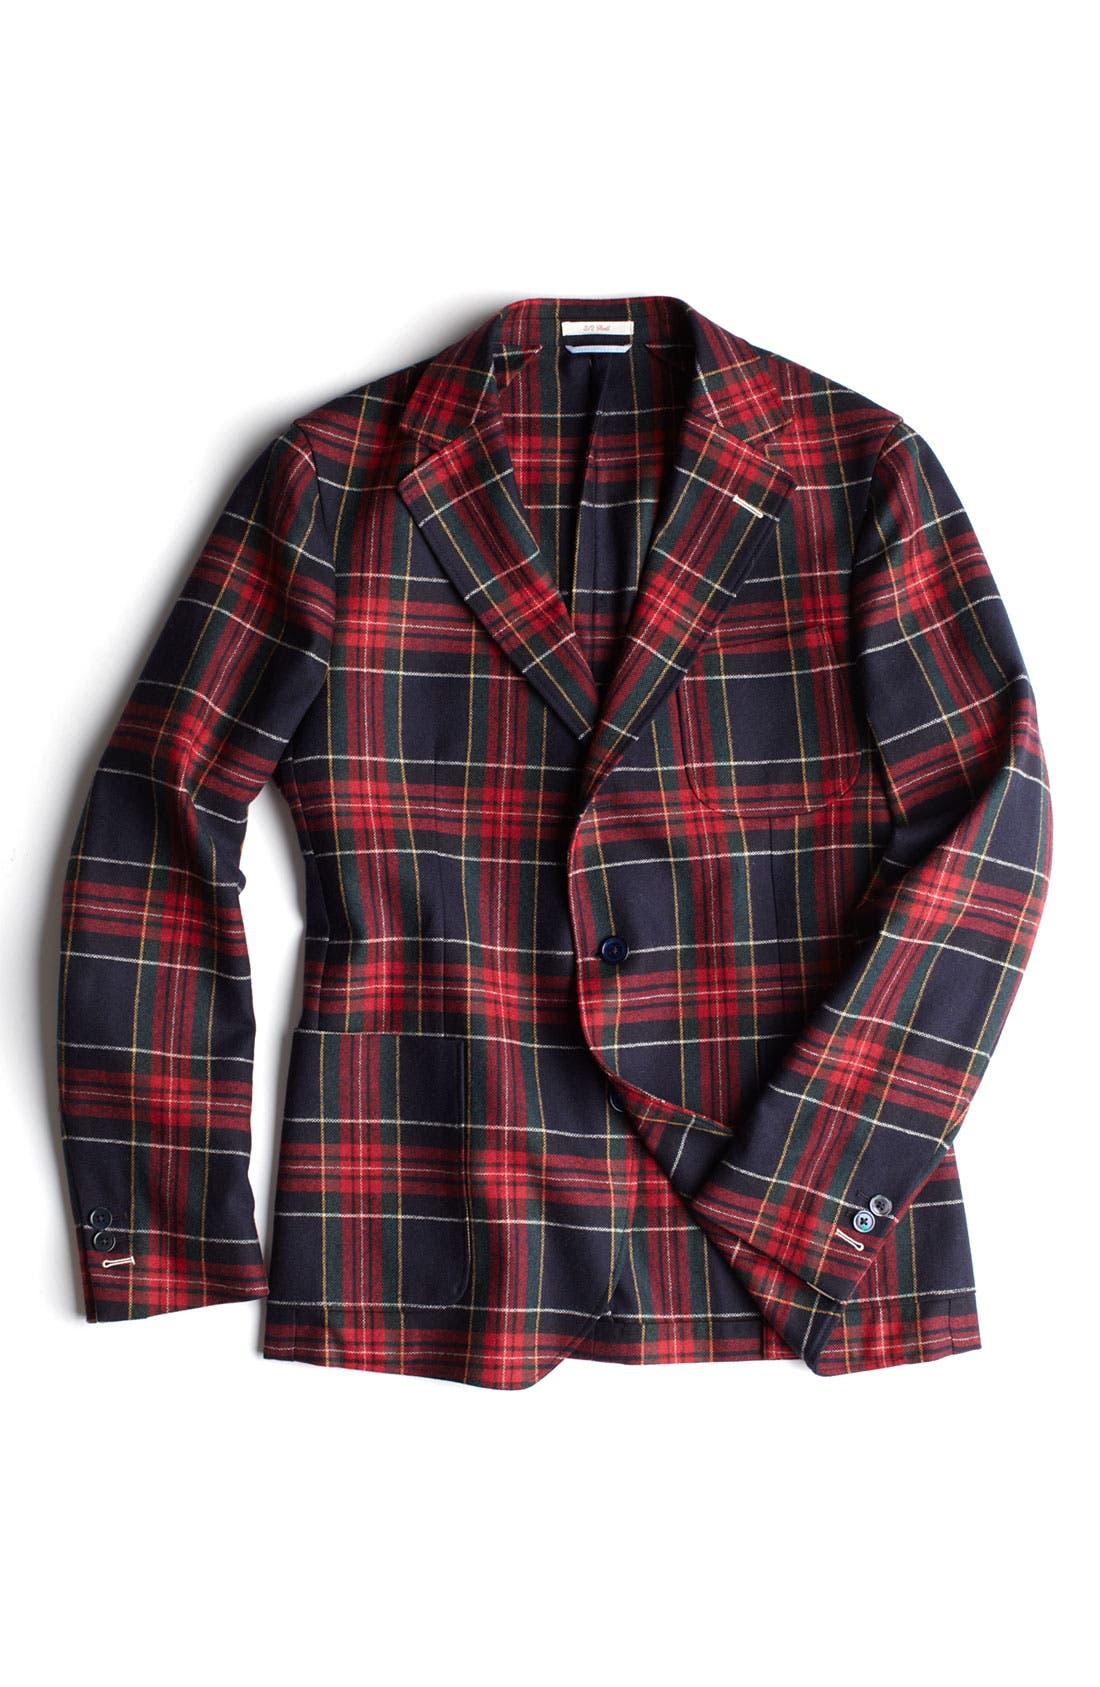 Alternate Image 3  - Gant Rugger Tartan Plaid Sportcoat